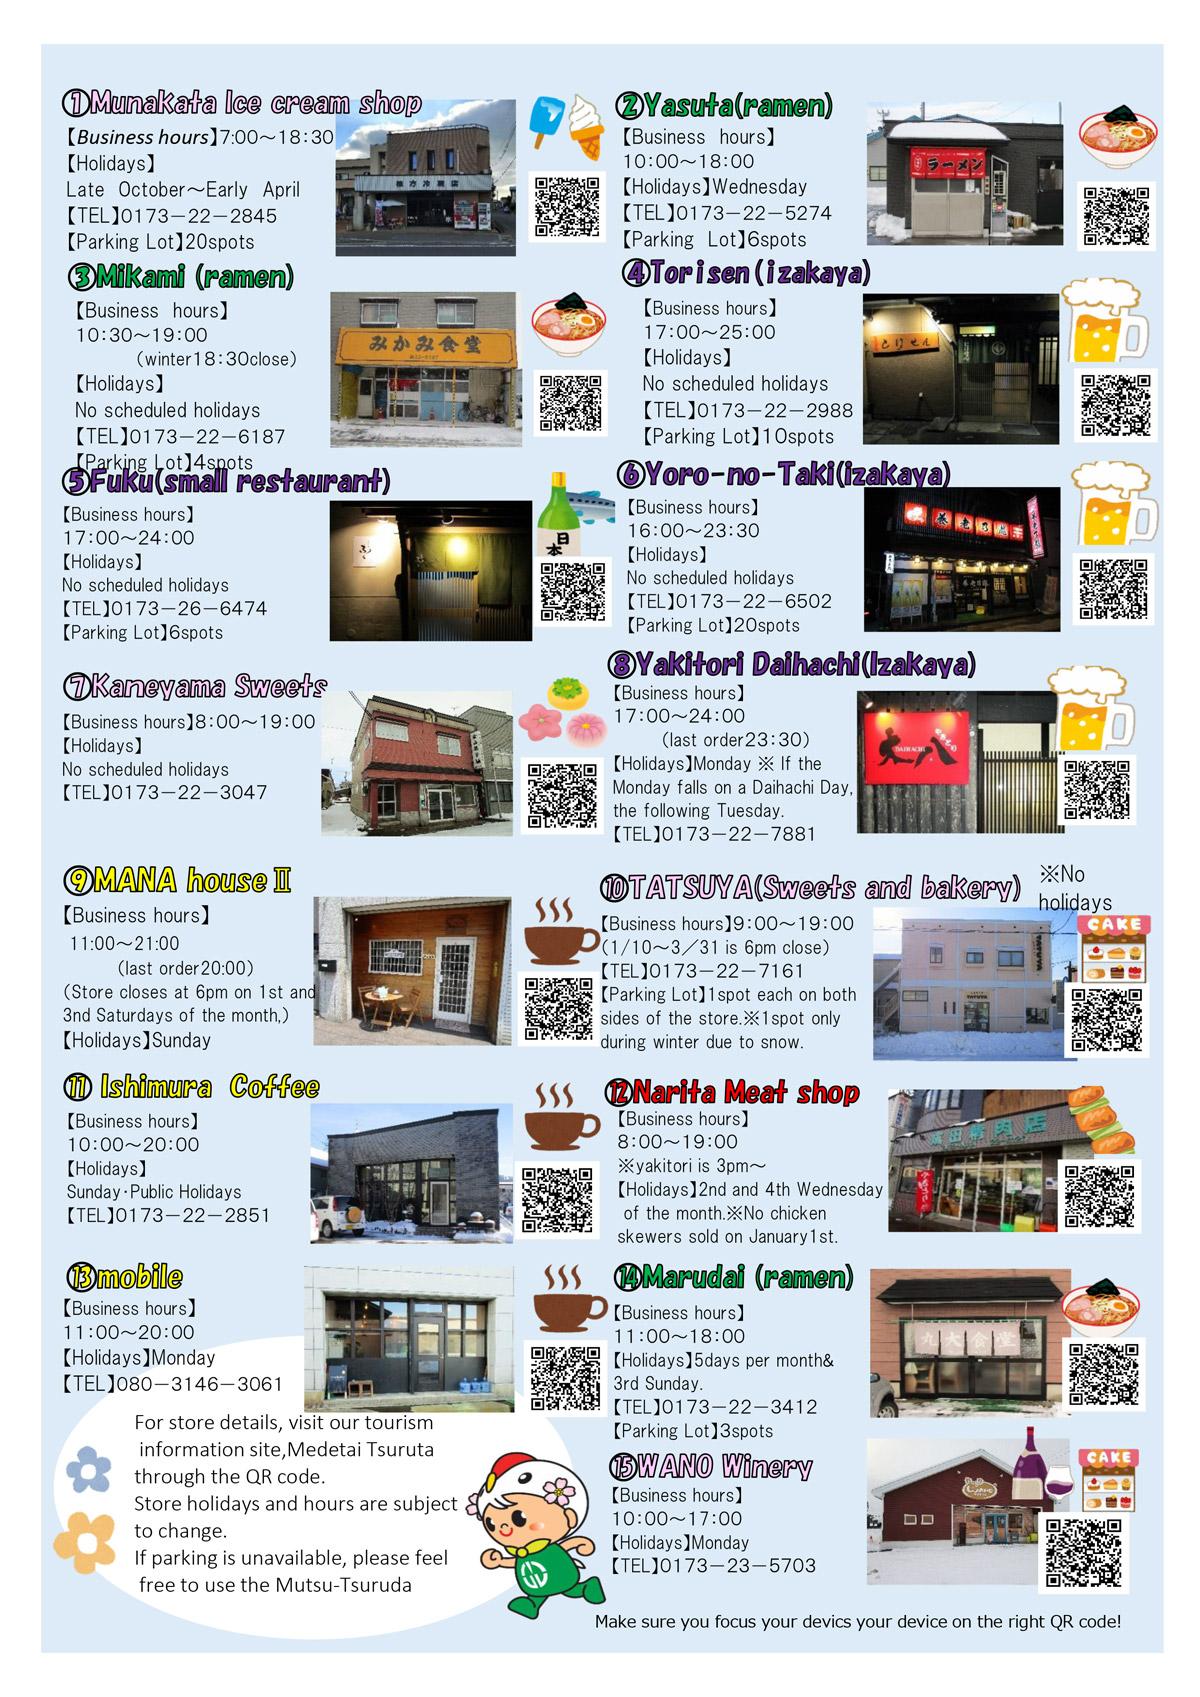 Tsuruta Food & drink map